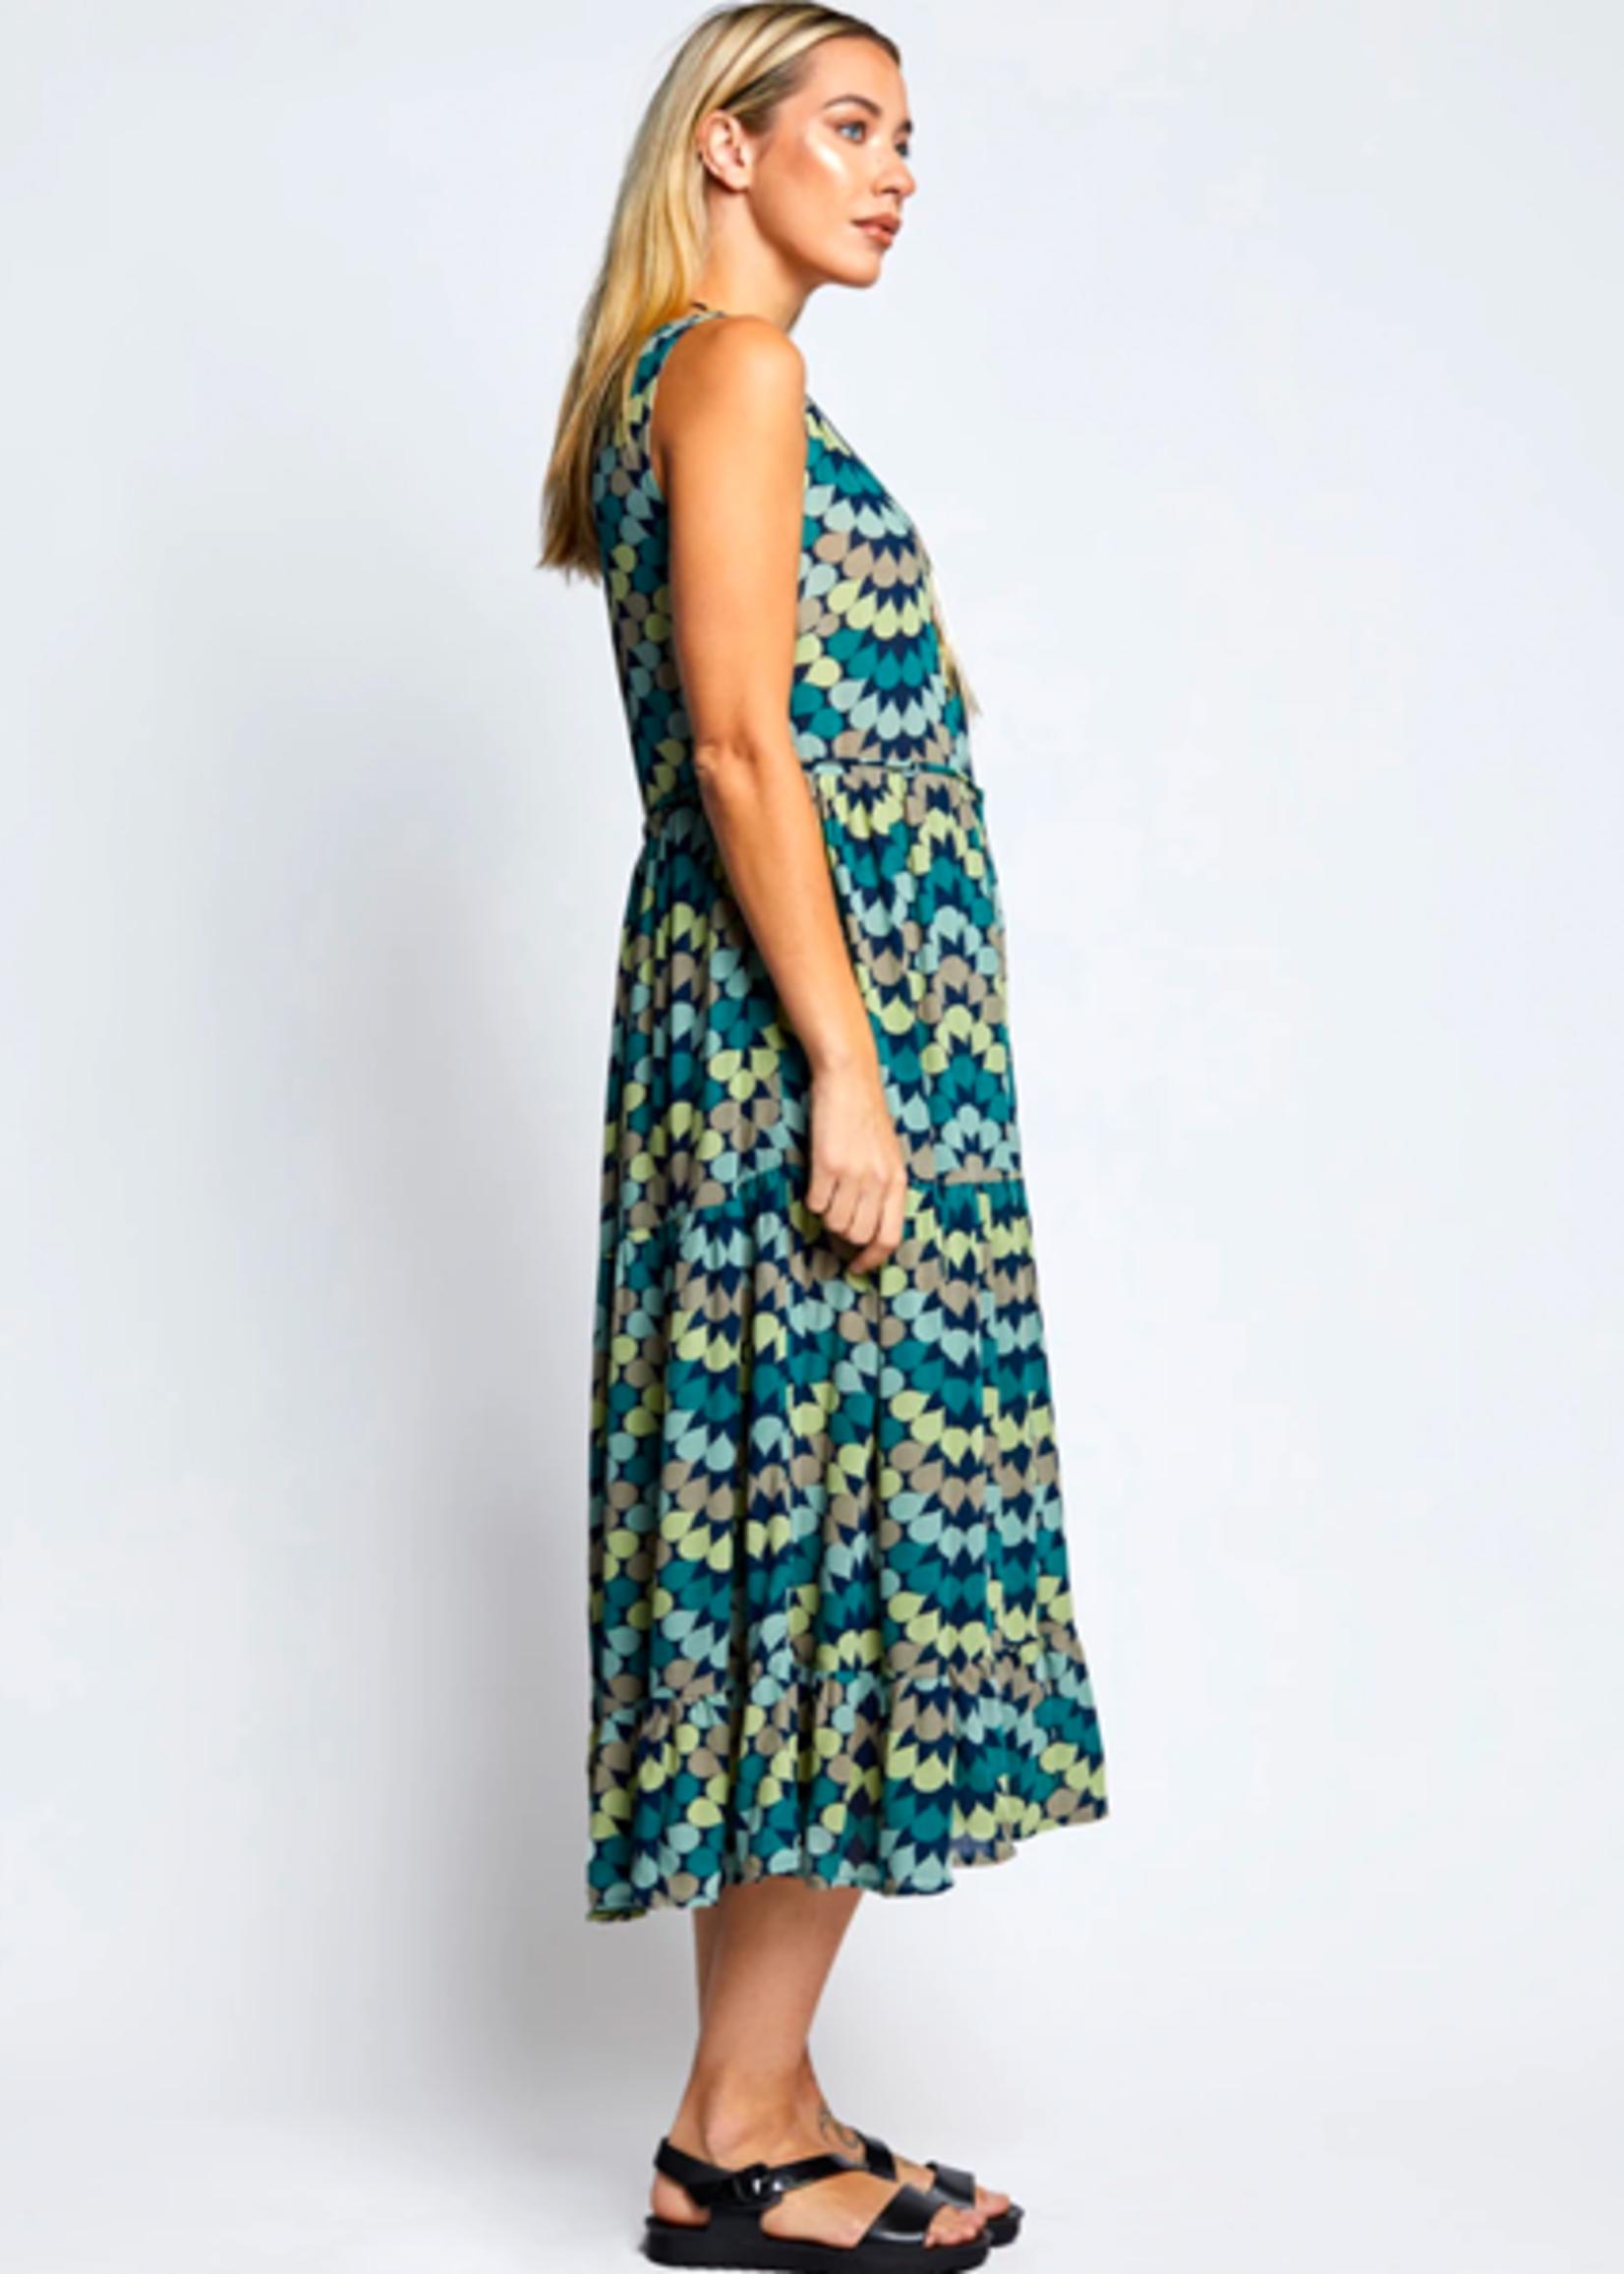 Totem Bisa Dress in Travel Eden